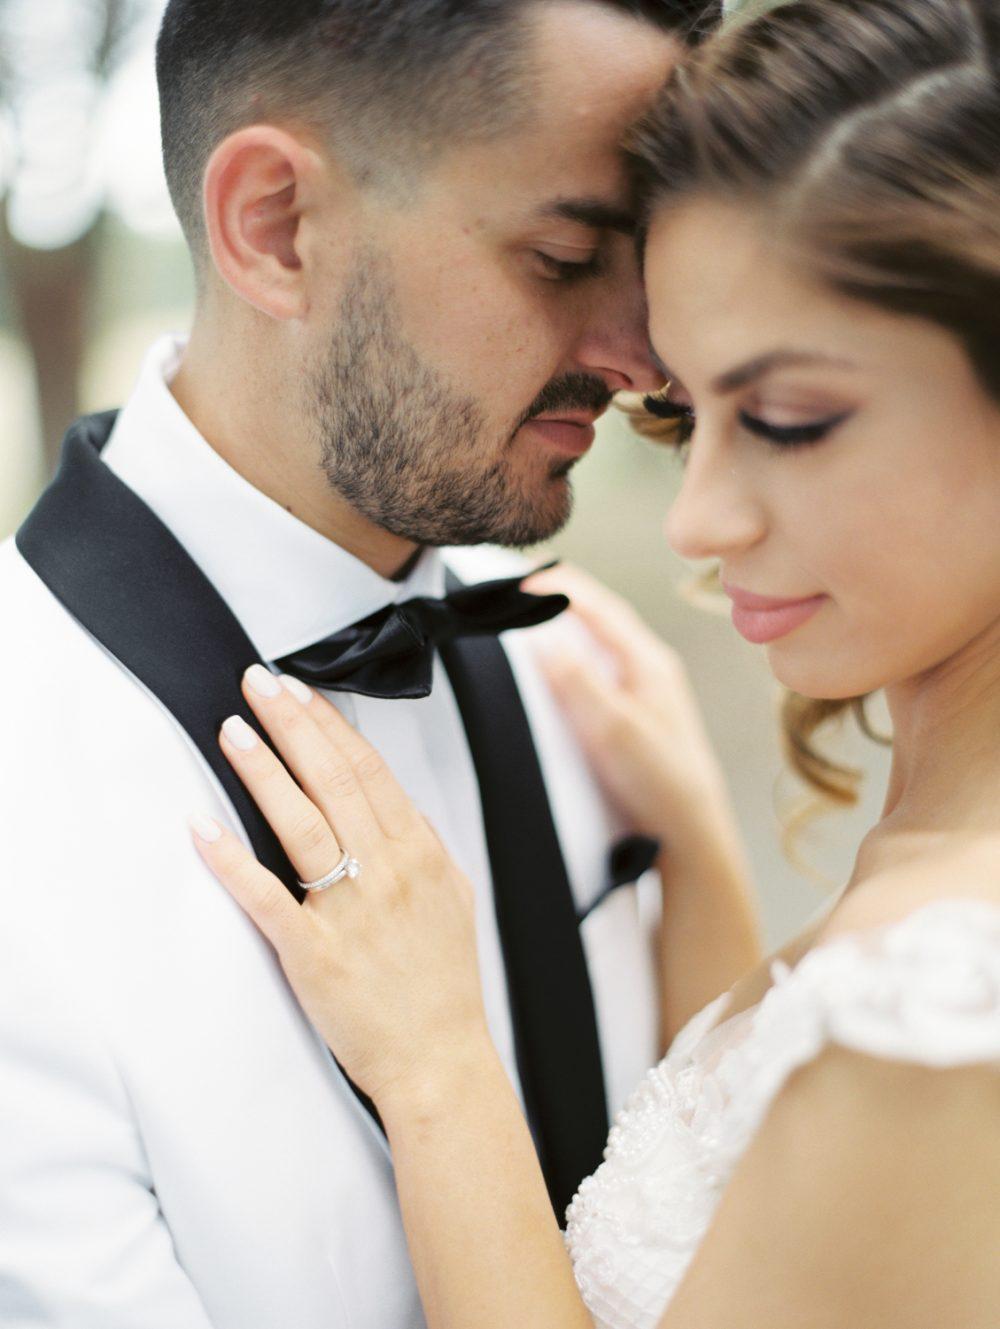 wedding photography sydney sueda and mu